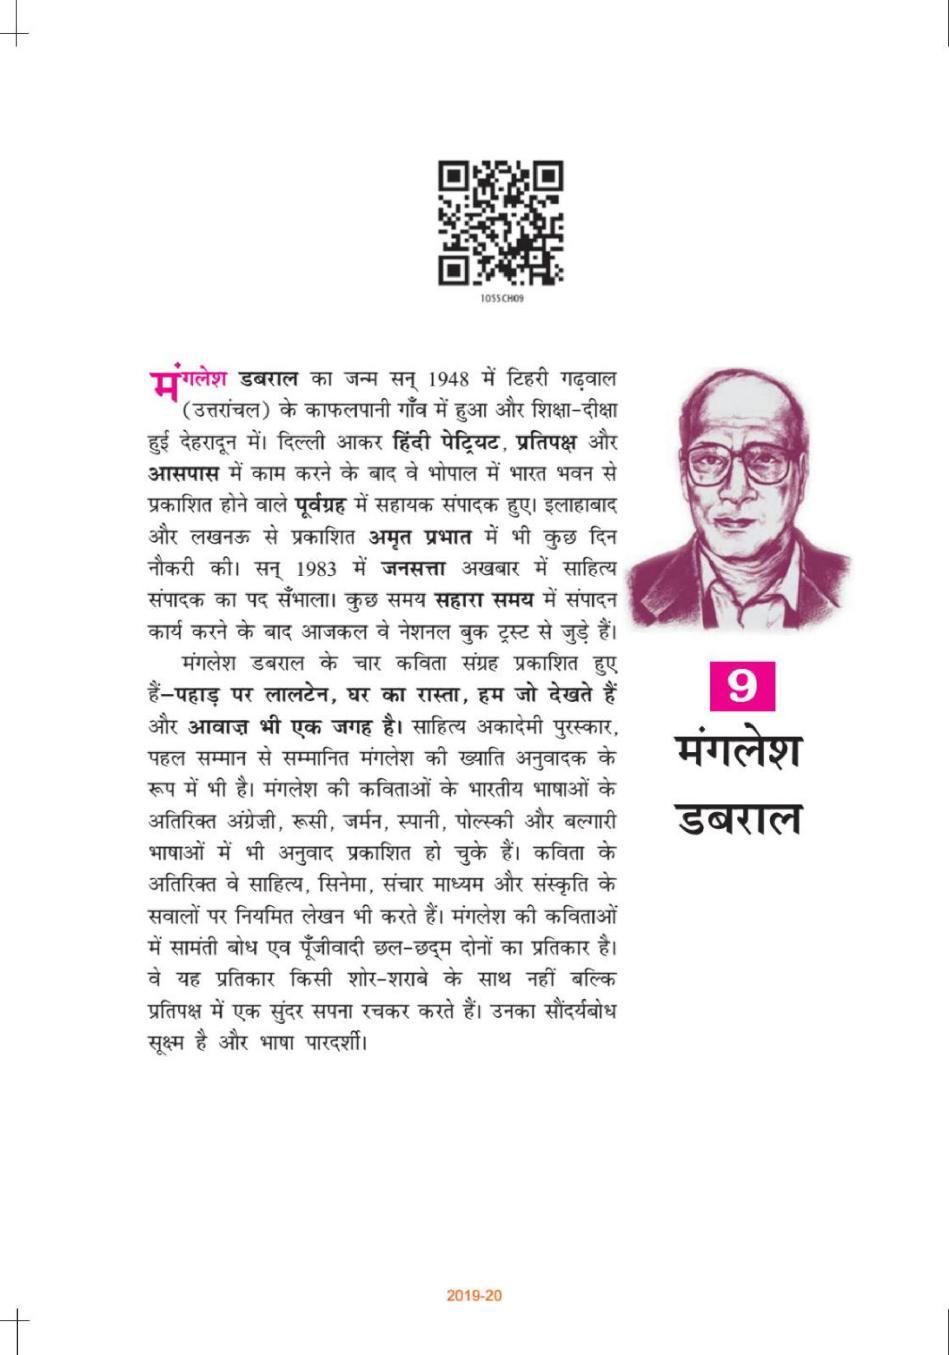 NCERT Book Class 10 Hindi (क्षितिज) Chapter 9 मंगलेश डबराल - Page 1